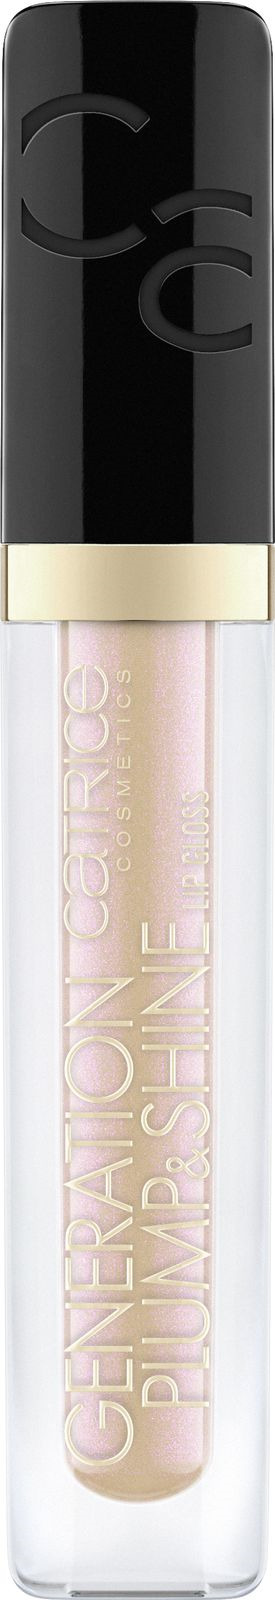 Блеск для губ Catrice Generation Plump & Shine Lip Gloss , 090 Golden Zircon